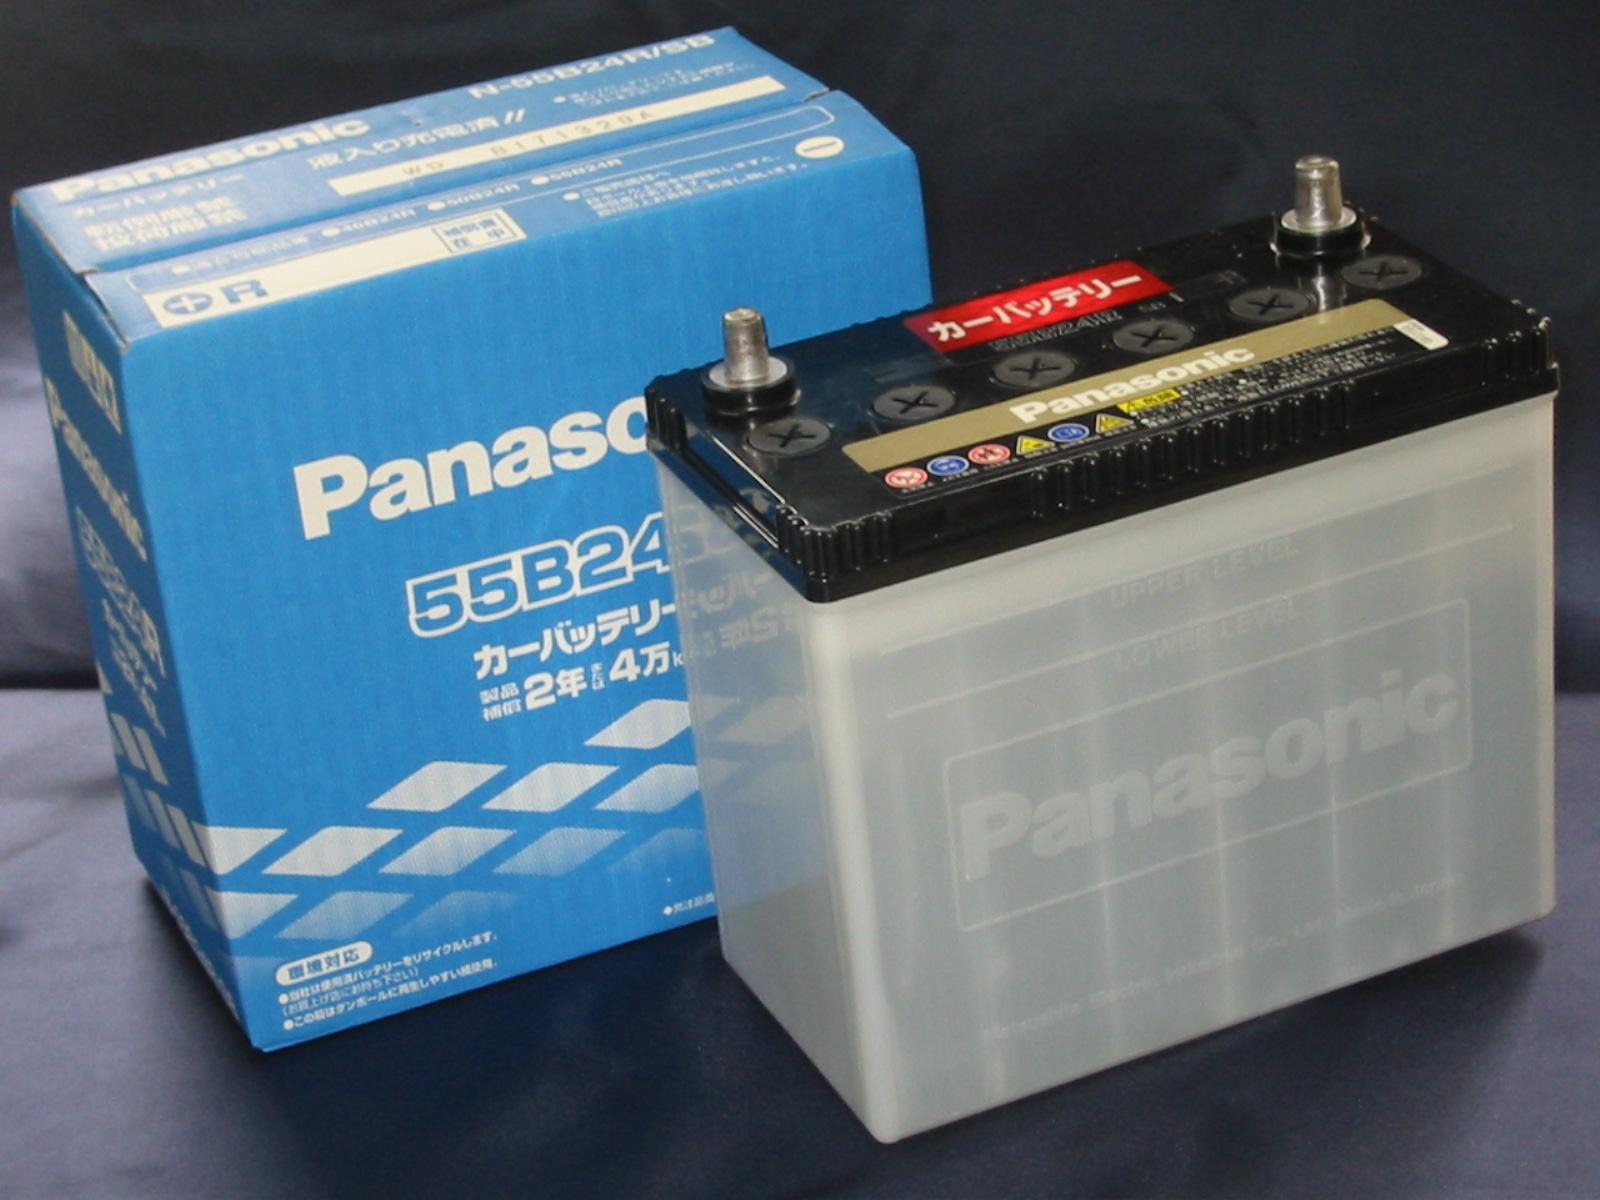 Panasonic 55B24R バッテリー